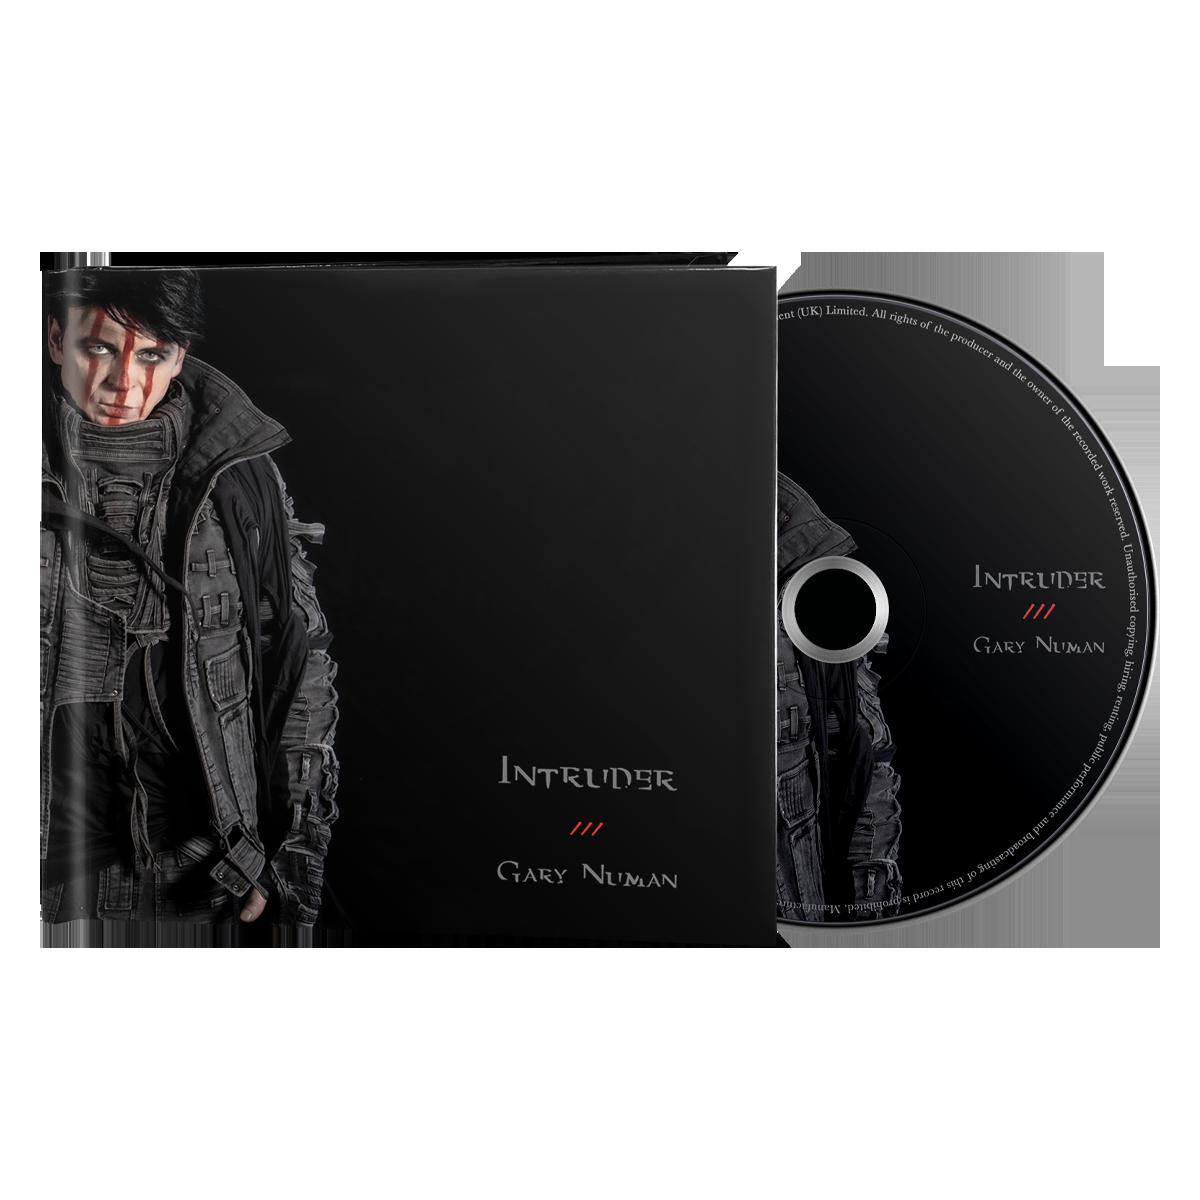 Intruder Deluxe CD